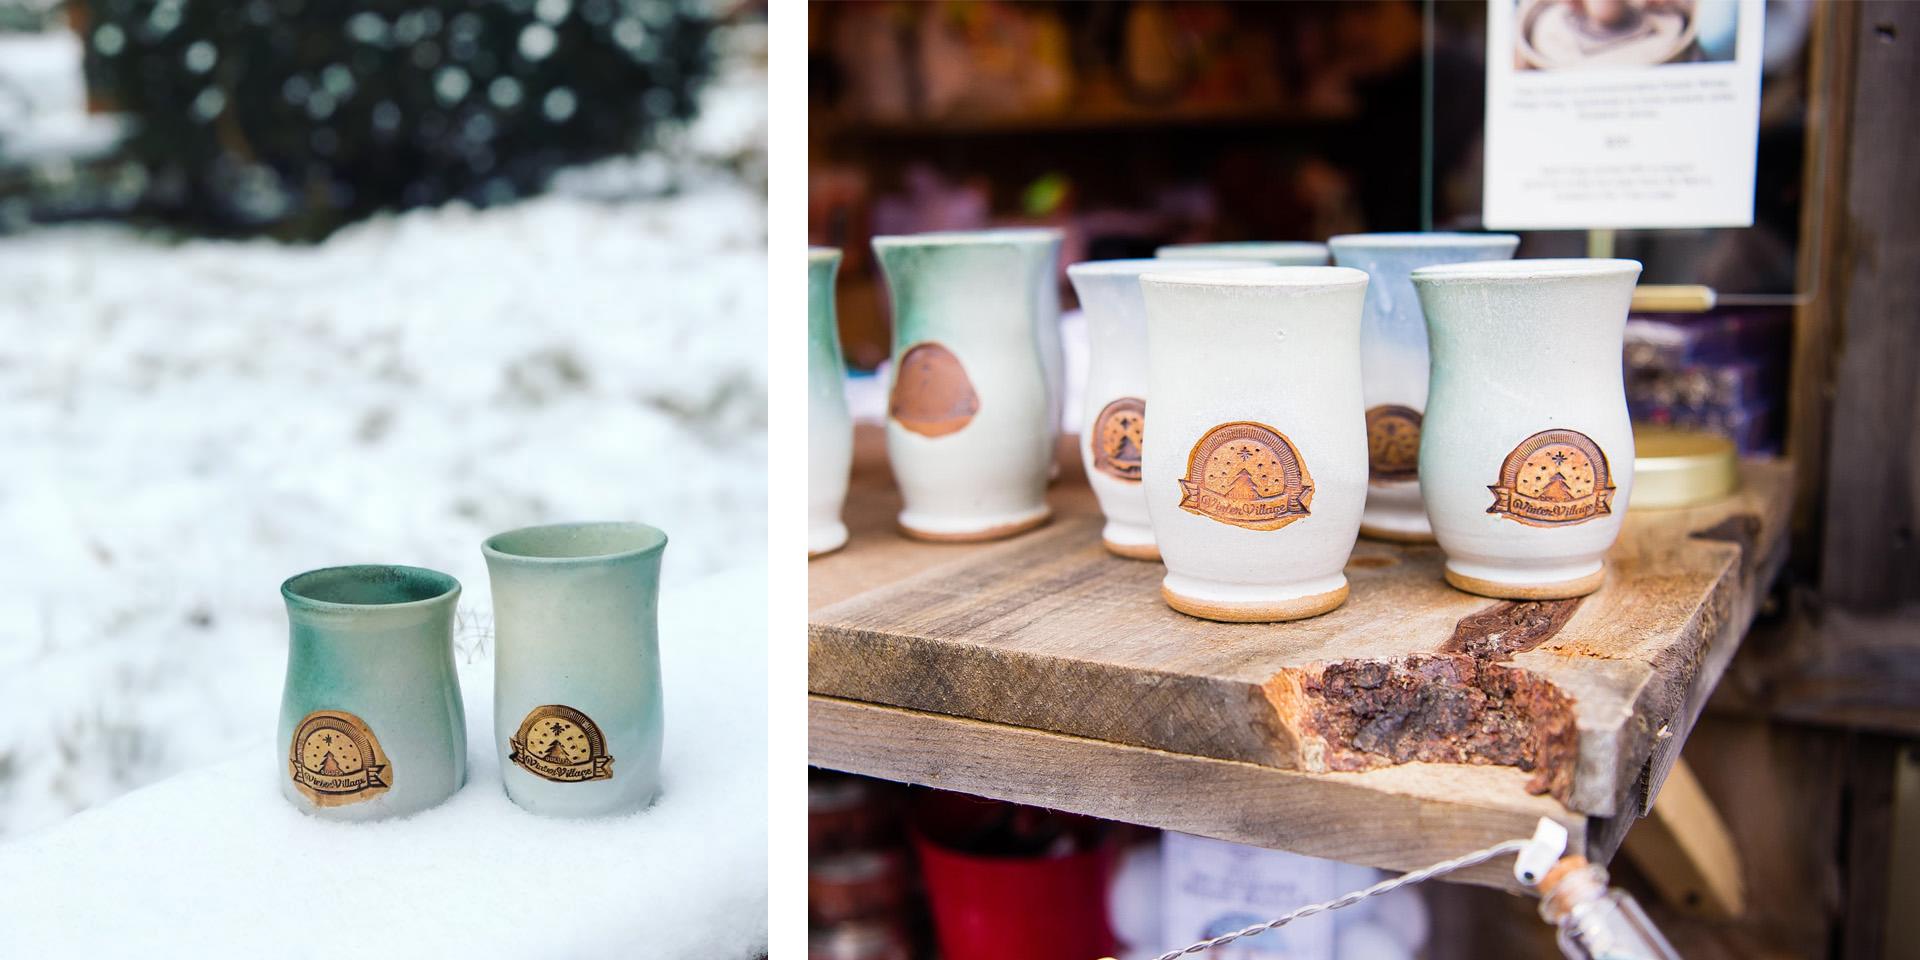 Duluth Winter Village Hand-crafted Mugs by local artist Liz James in Duluth, Minnesota